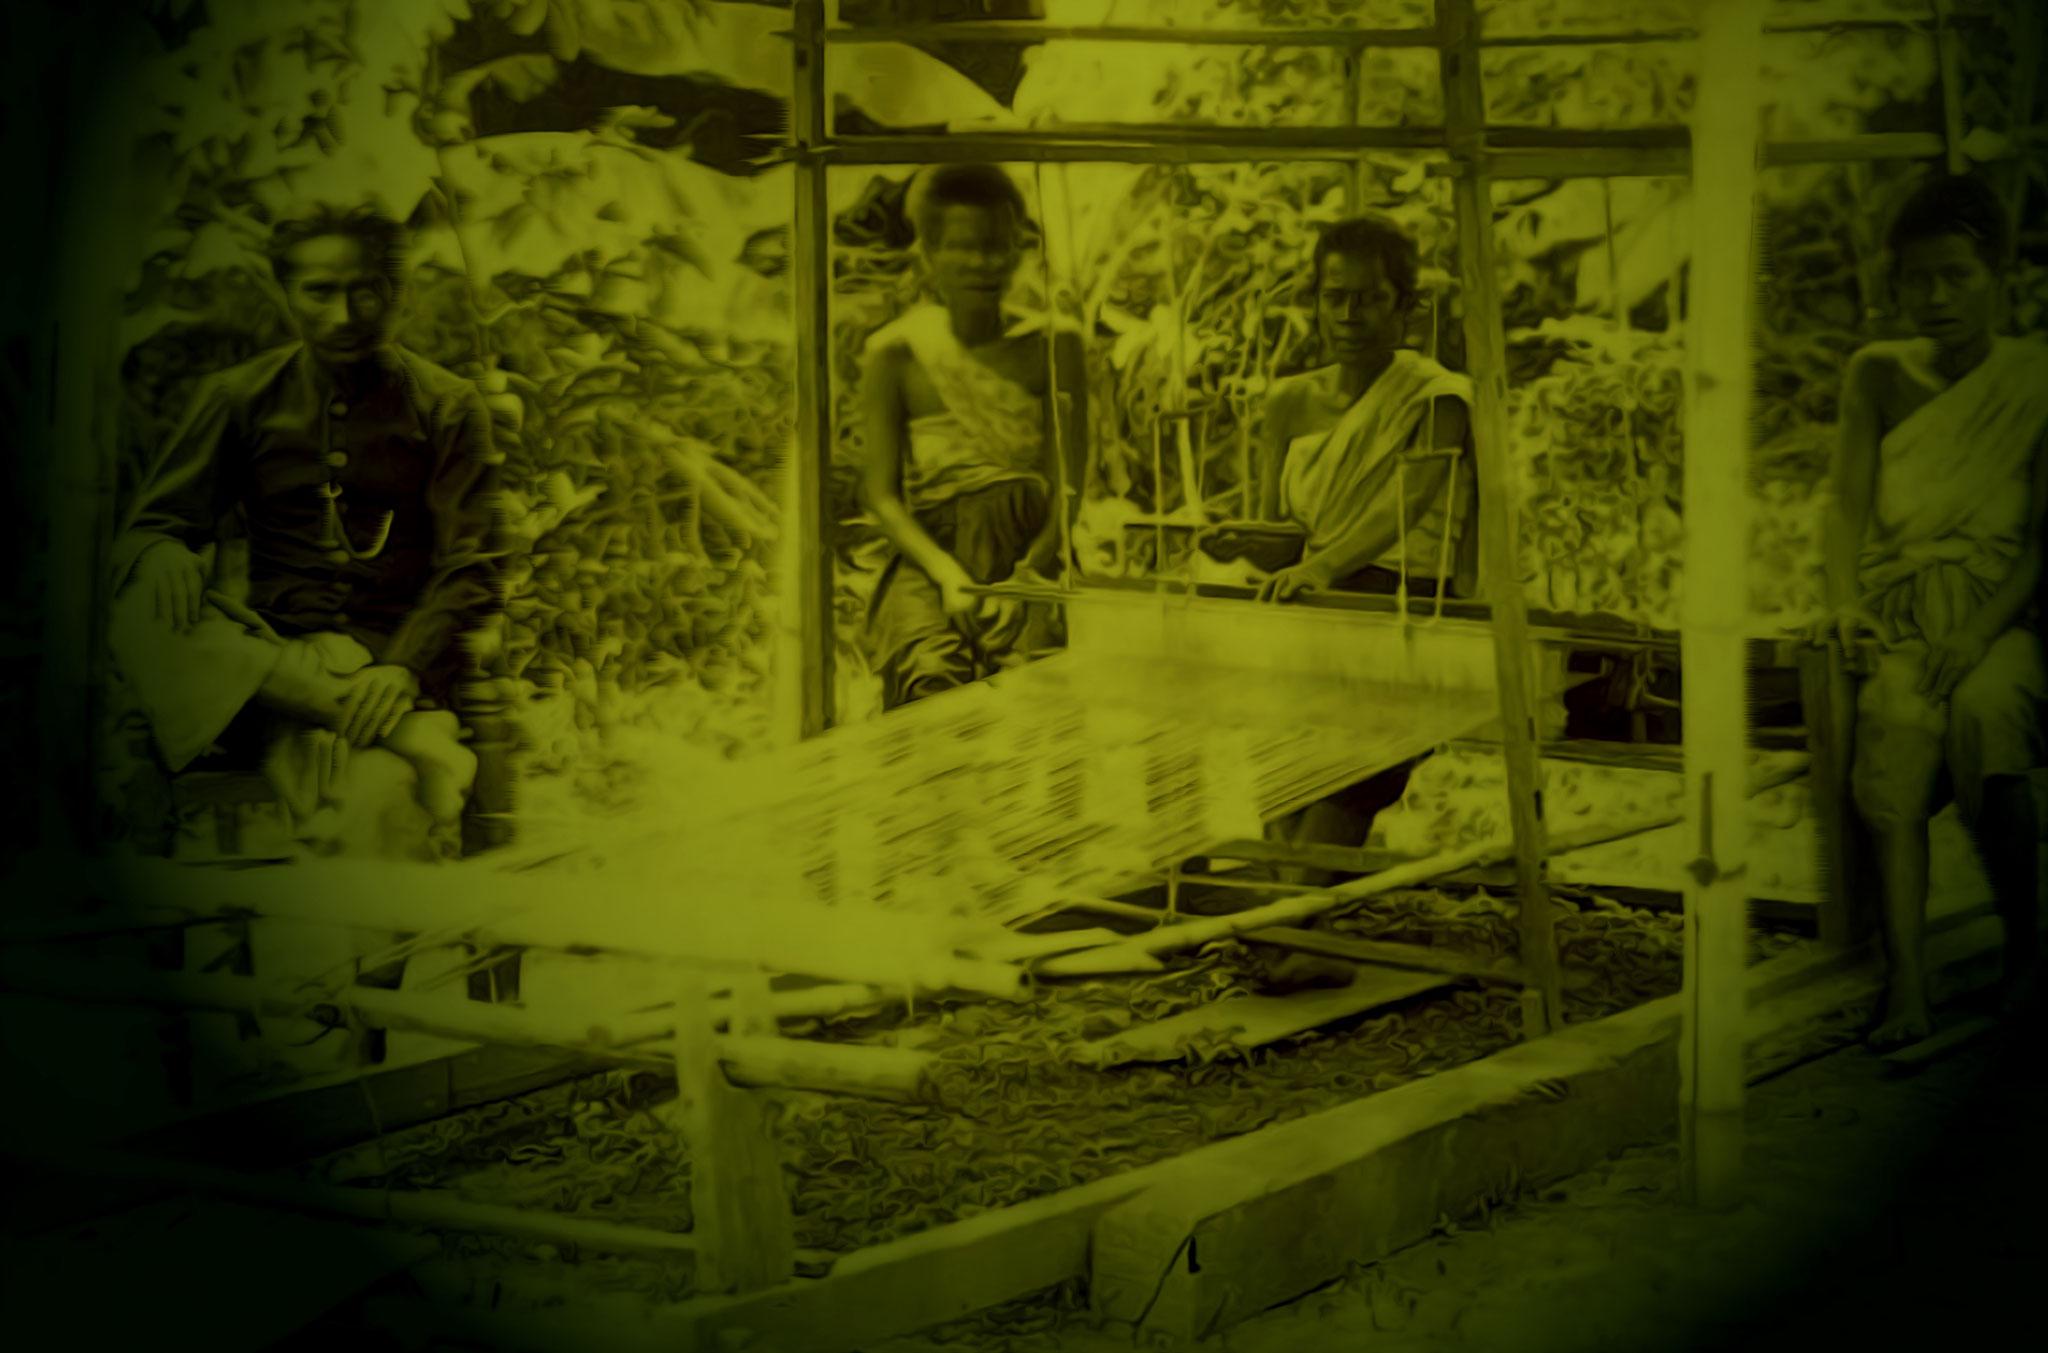 Traditional weavers